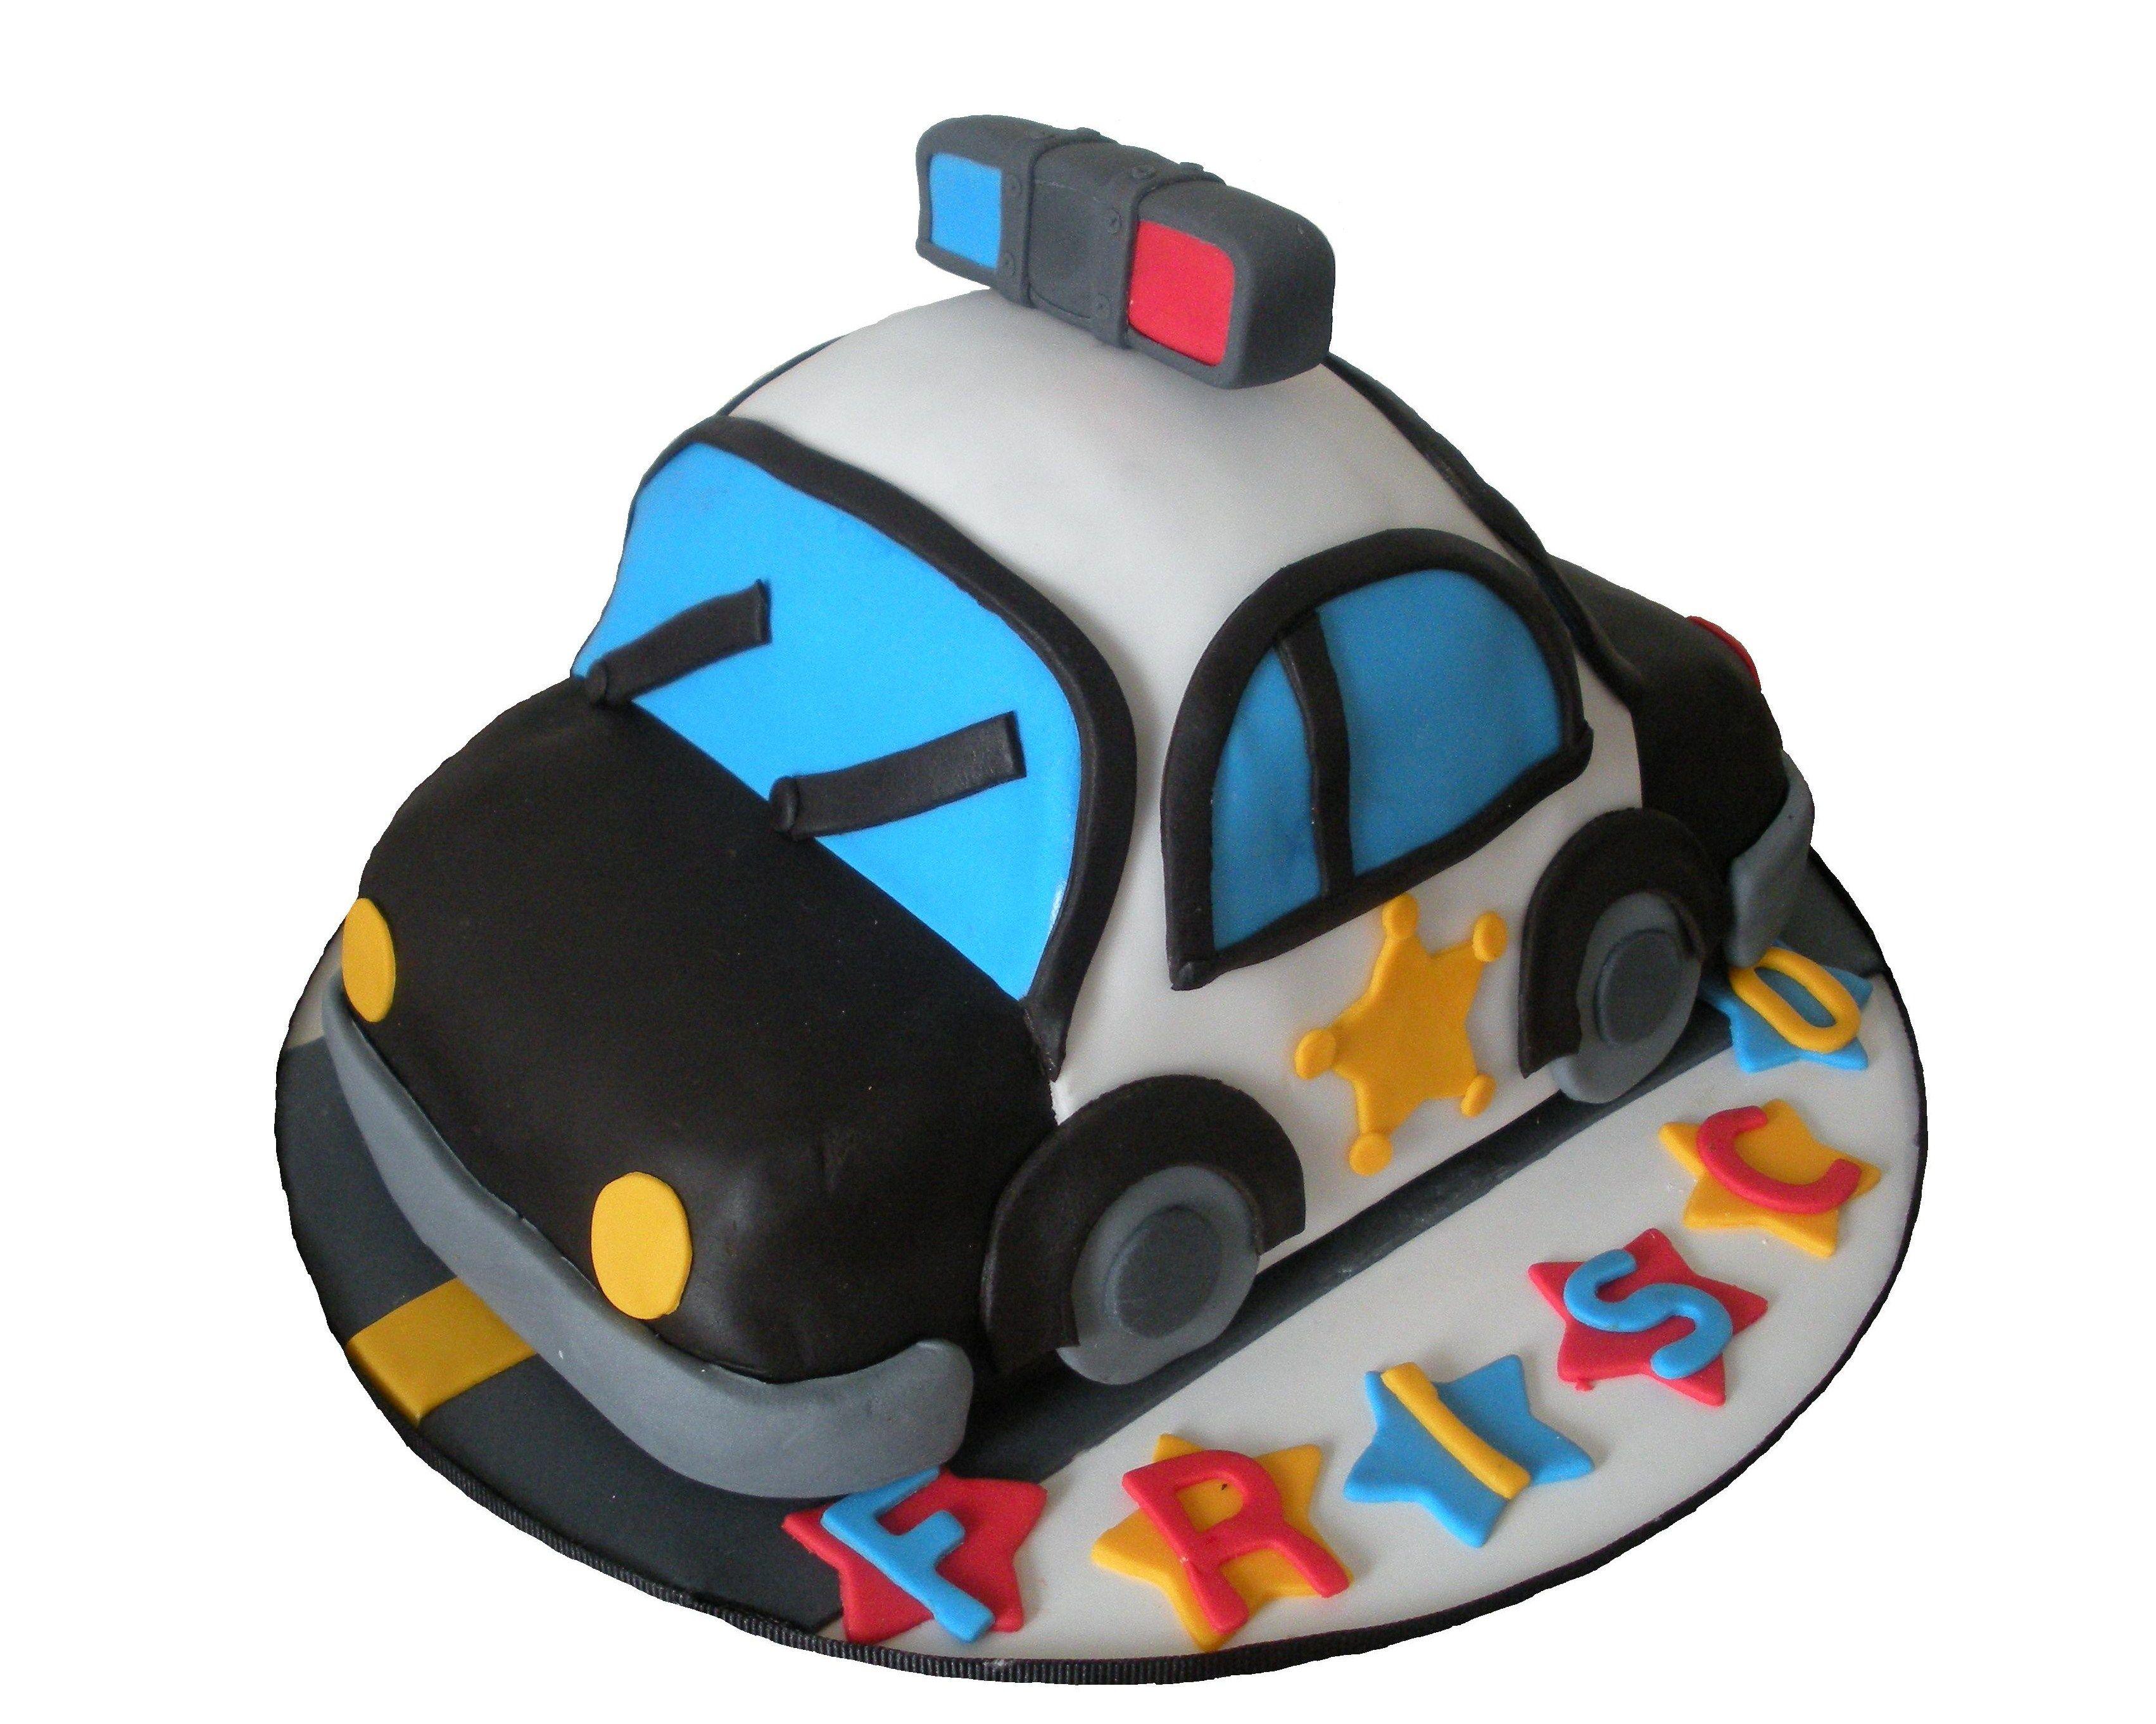 Police Car Cake Design : Pin Police Car Birthday Cake Cake on Pinterest